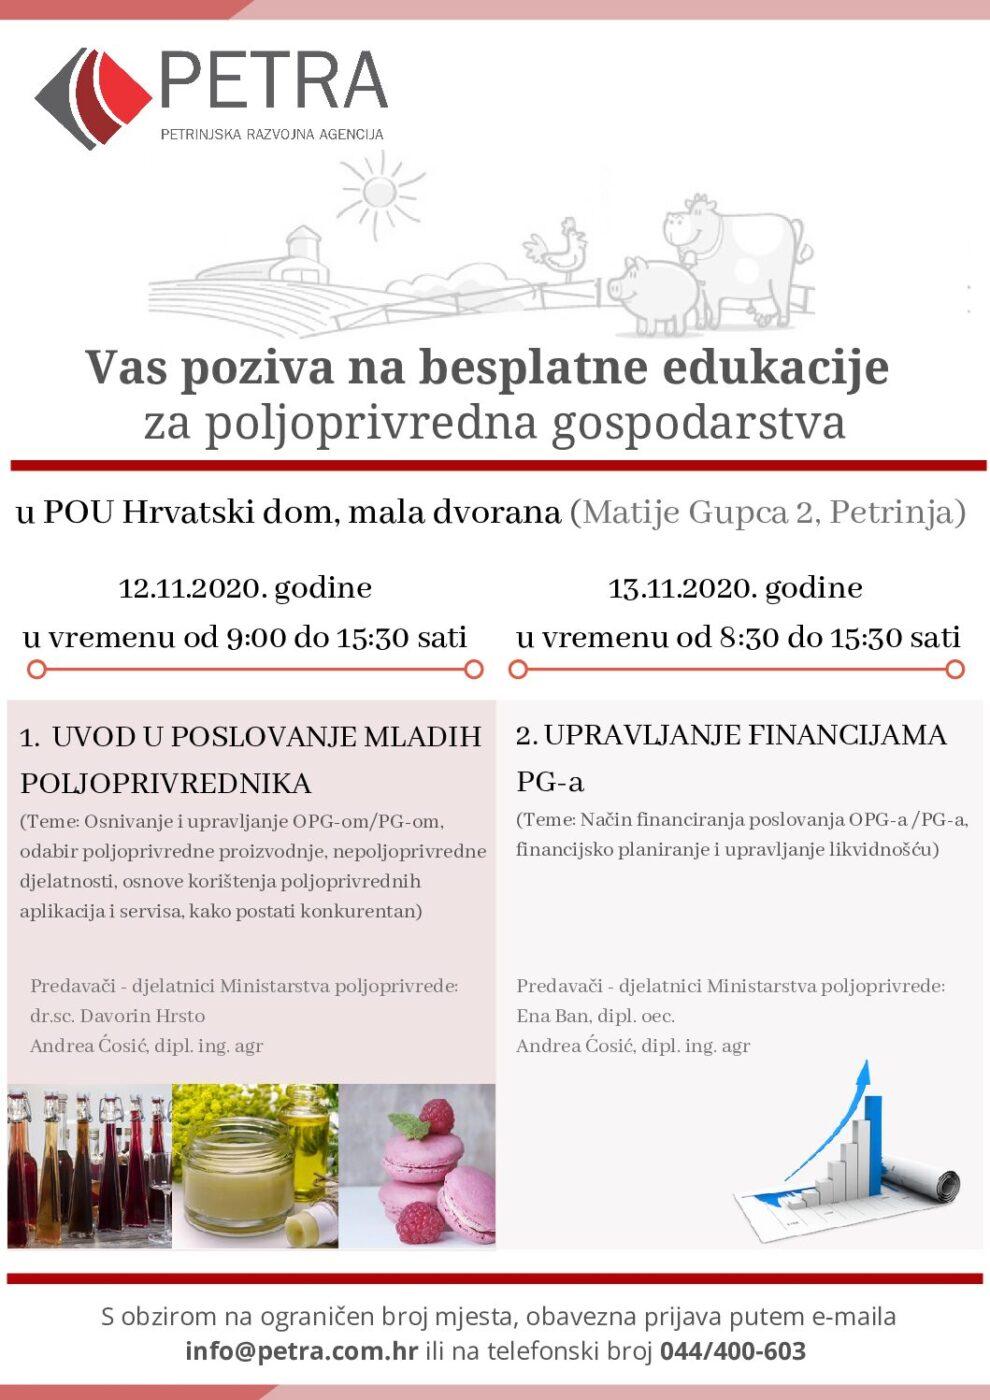 Besplatne edukacije za poljoprivredna gospodarstva